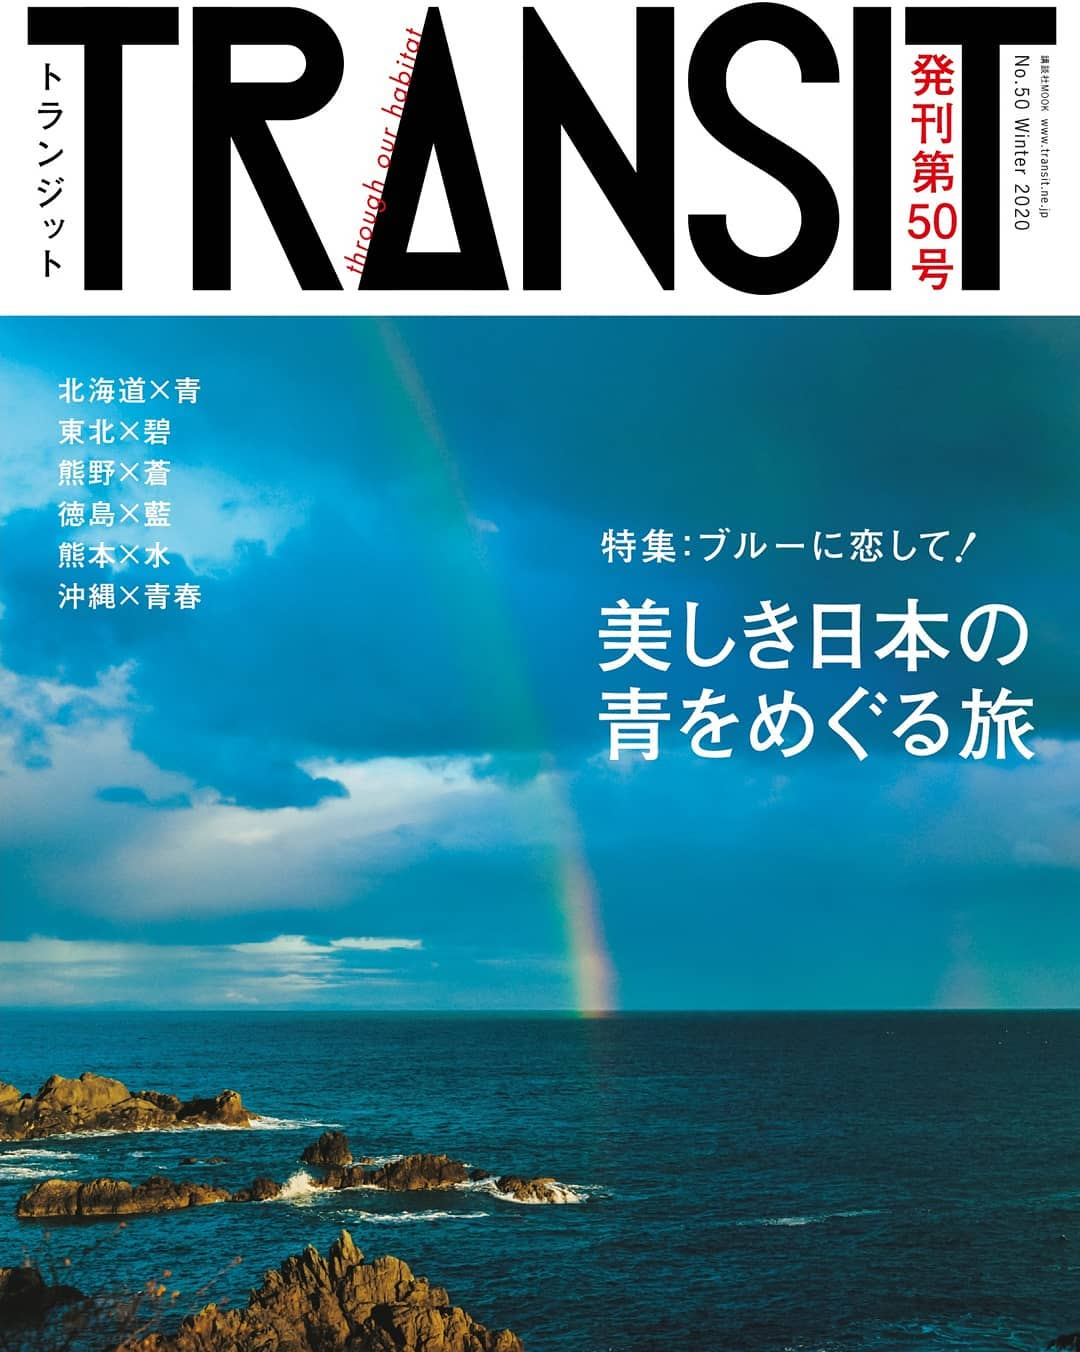 TRANSIT 発刊第50号